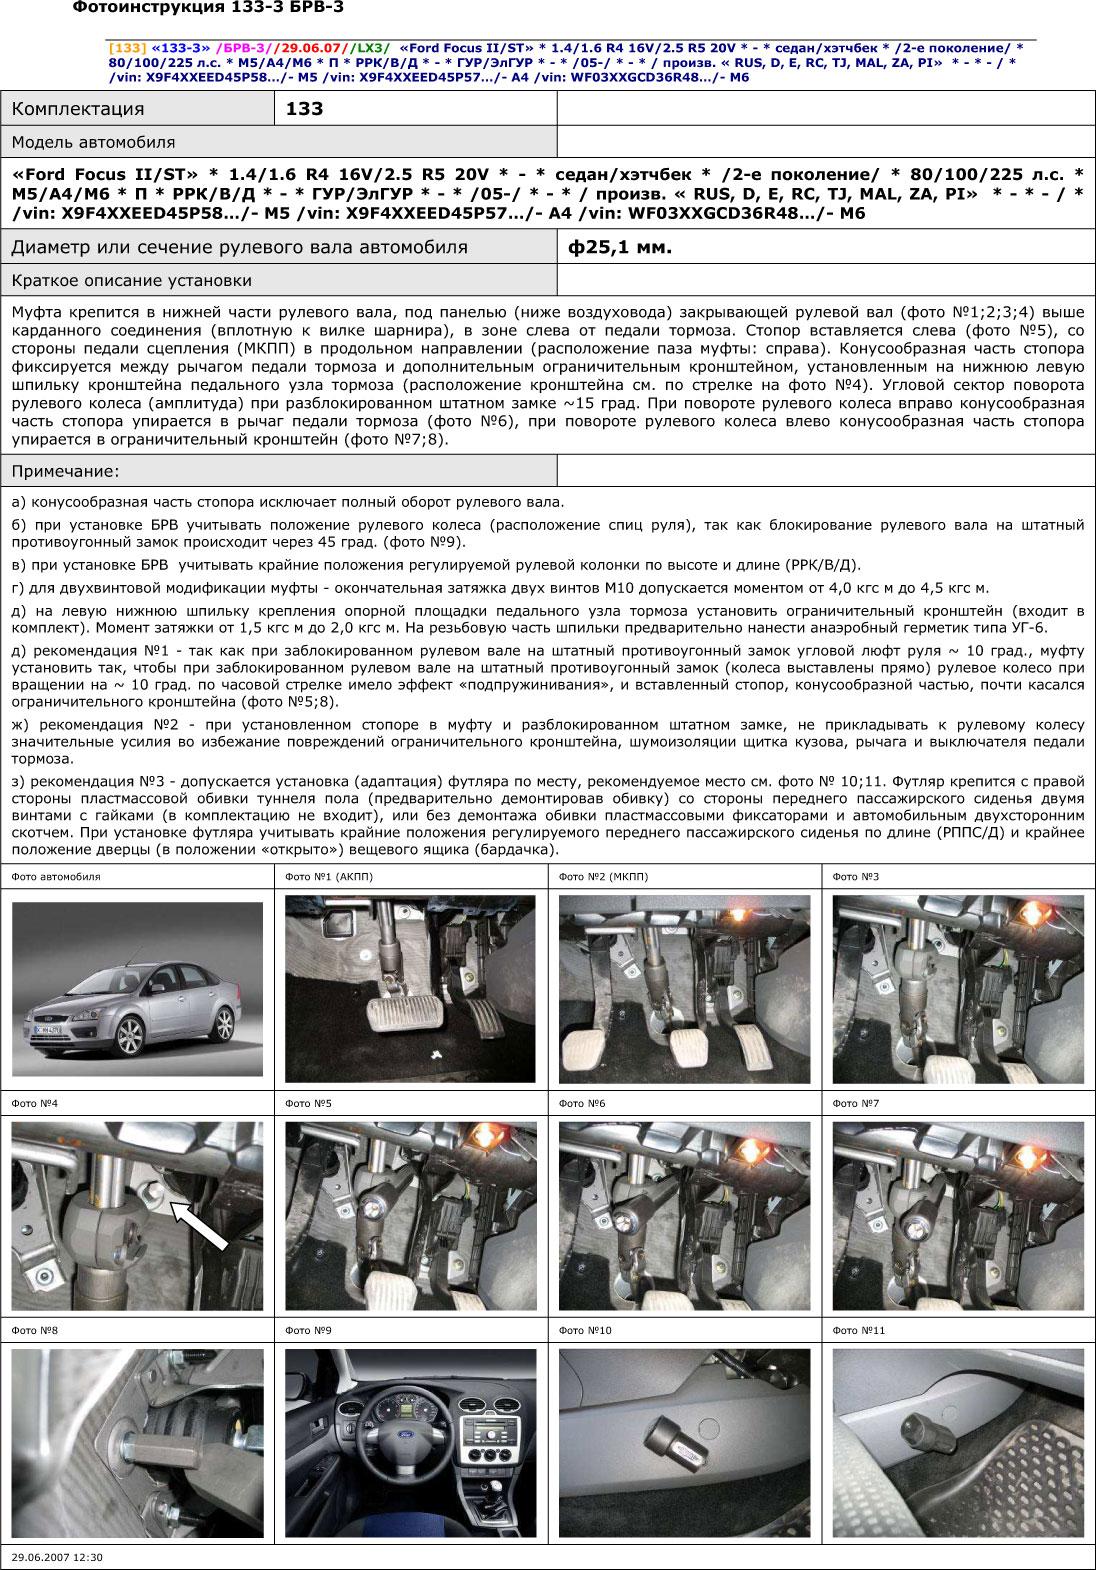 установка гарант блок люкс 133 на ford focus 2 2011